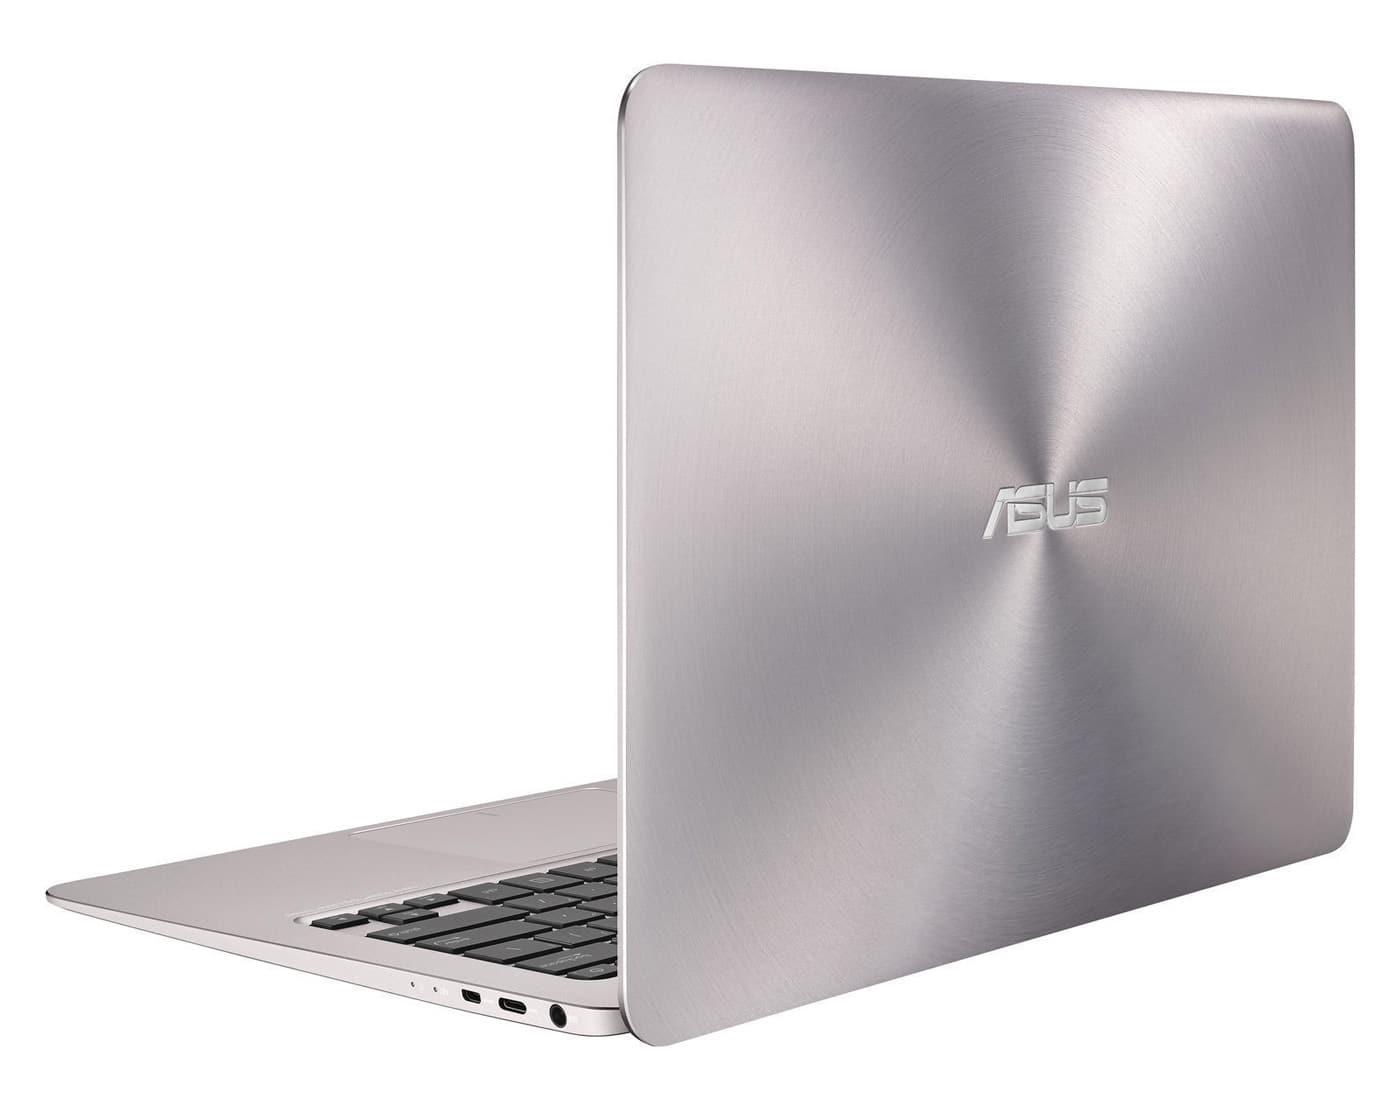 soldes 699 asus zenbook ux306ua fb125t ultrabook 13 pouces qhd ssd i5 laptopspirit. Black Bedroom Furniture Sets. Home Design Ideas